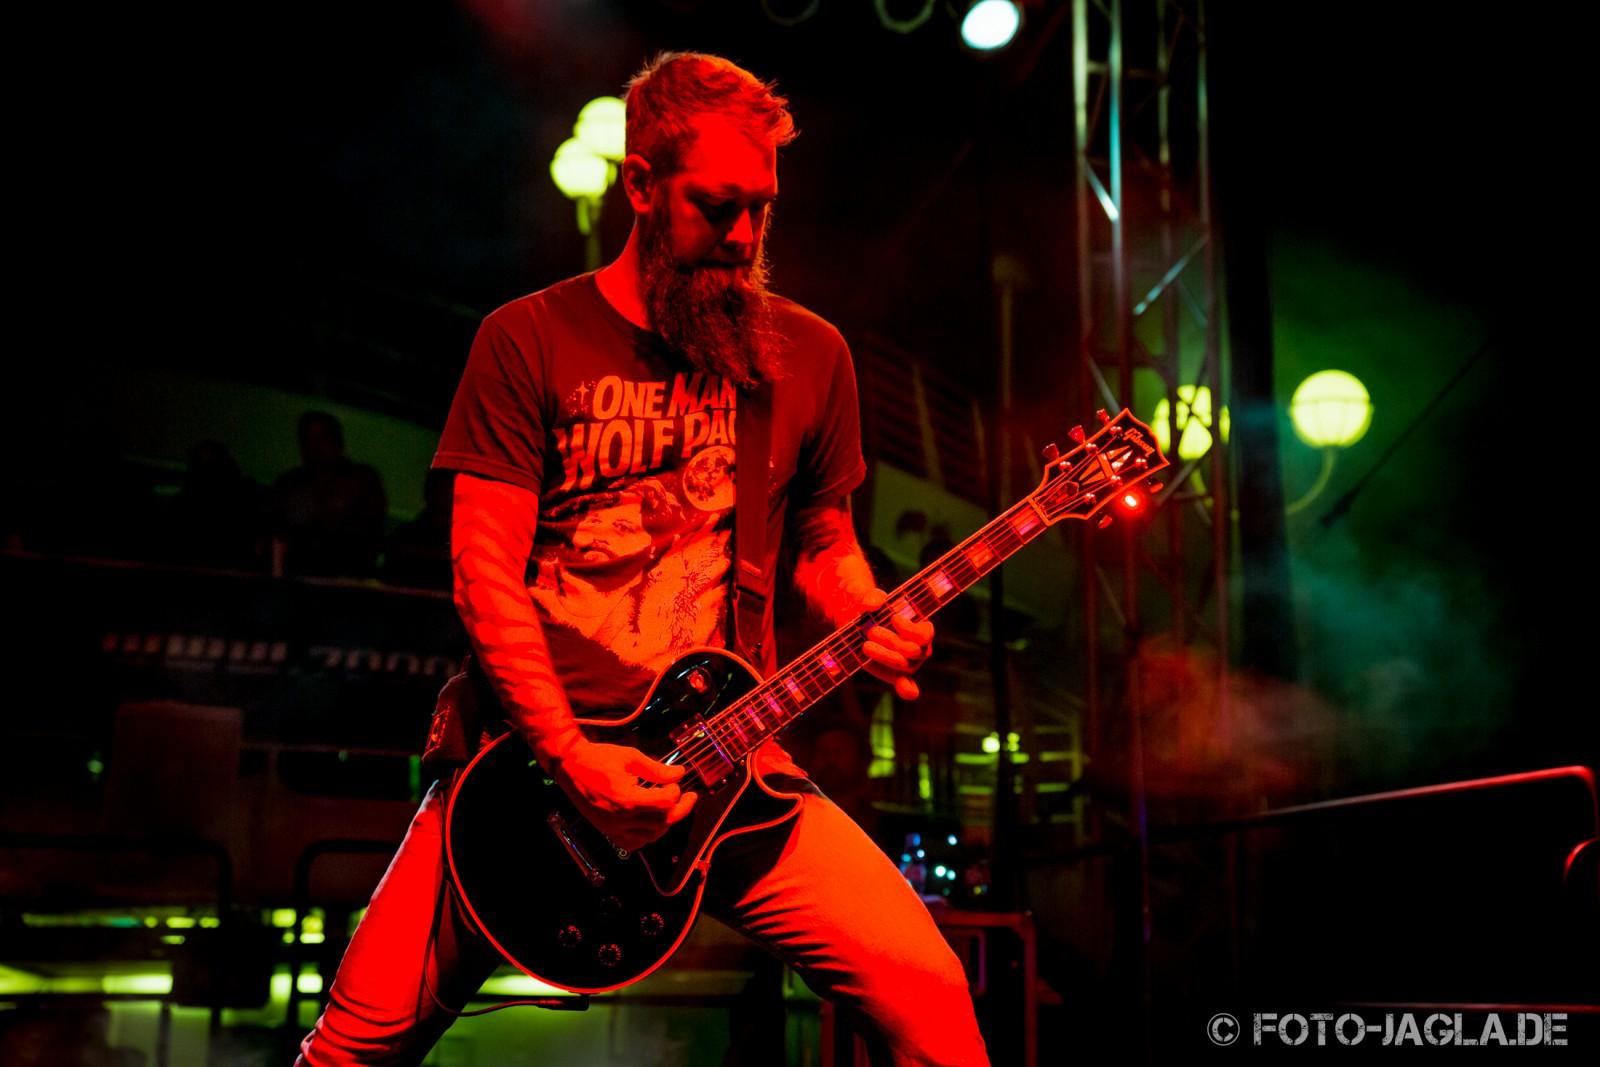 70000 Tons of Metal 2013 ::. In Flames ::. http://www.foto-jagla.de